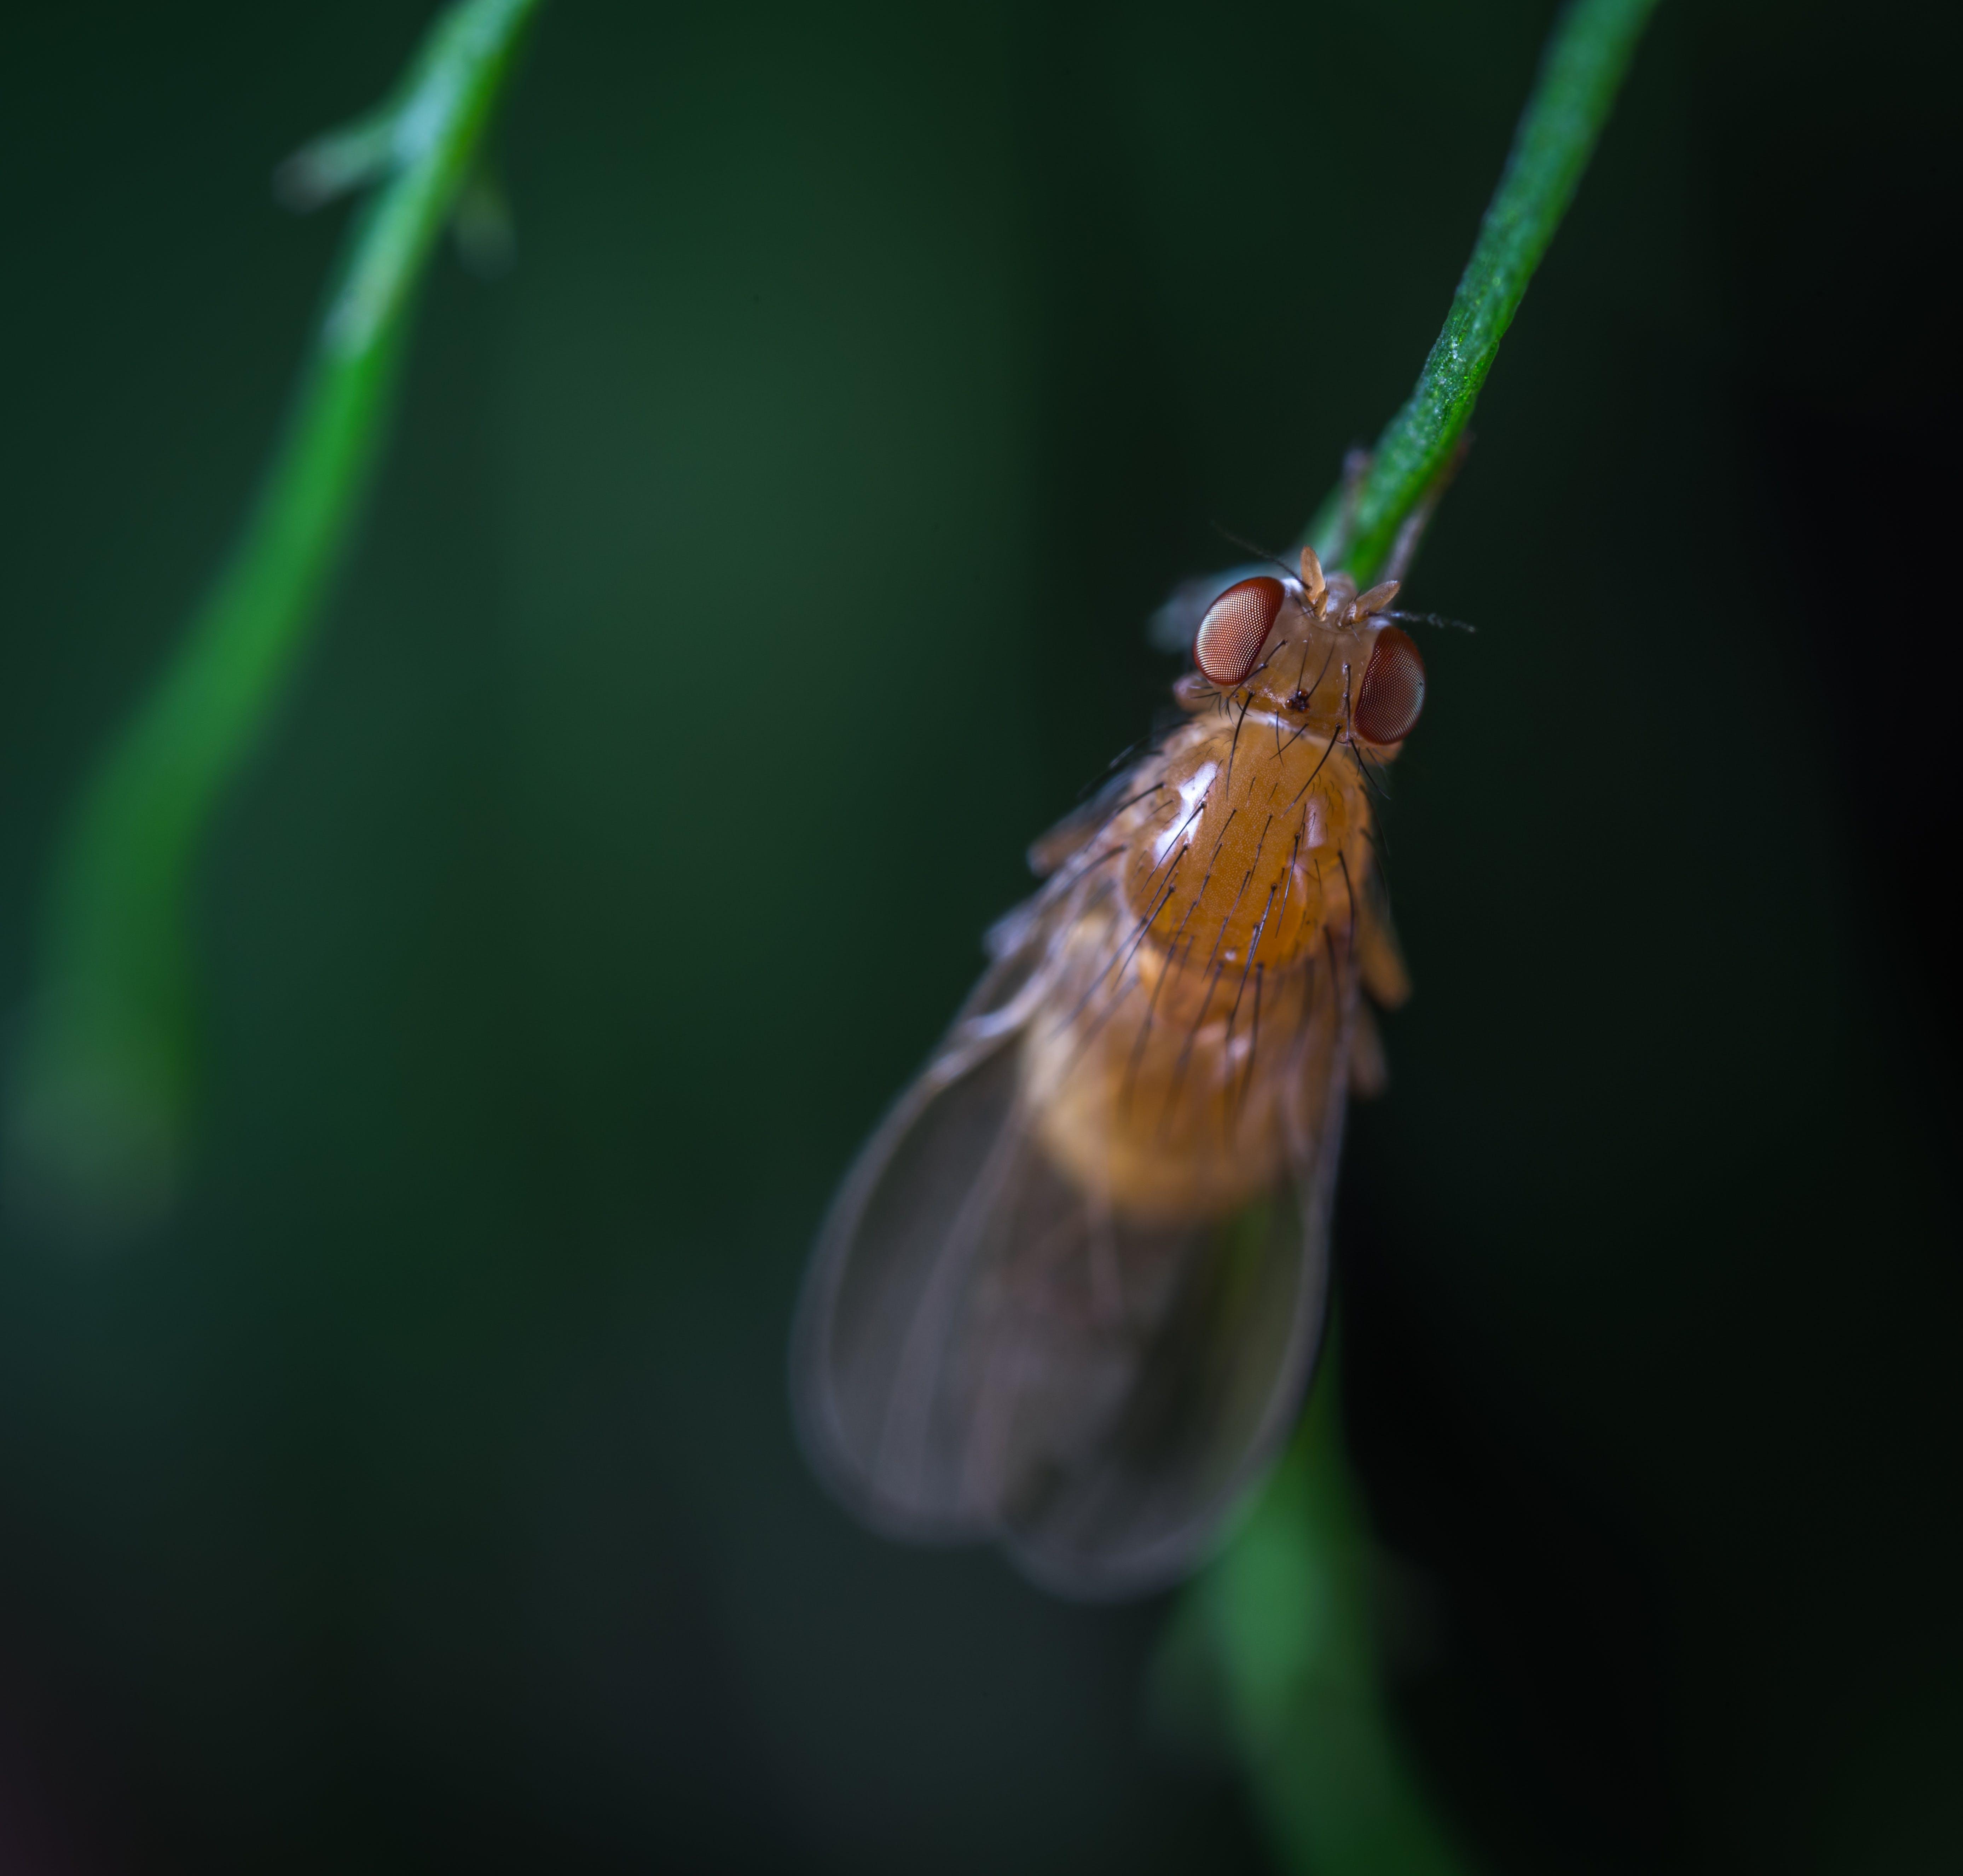 Kostenloses Stock Foto zu biologie, entomologie, flügel, insekt